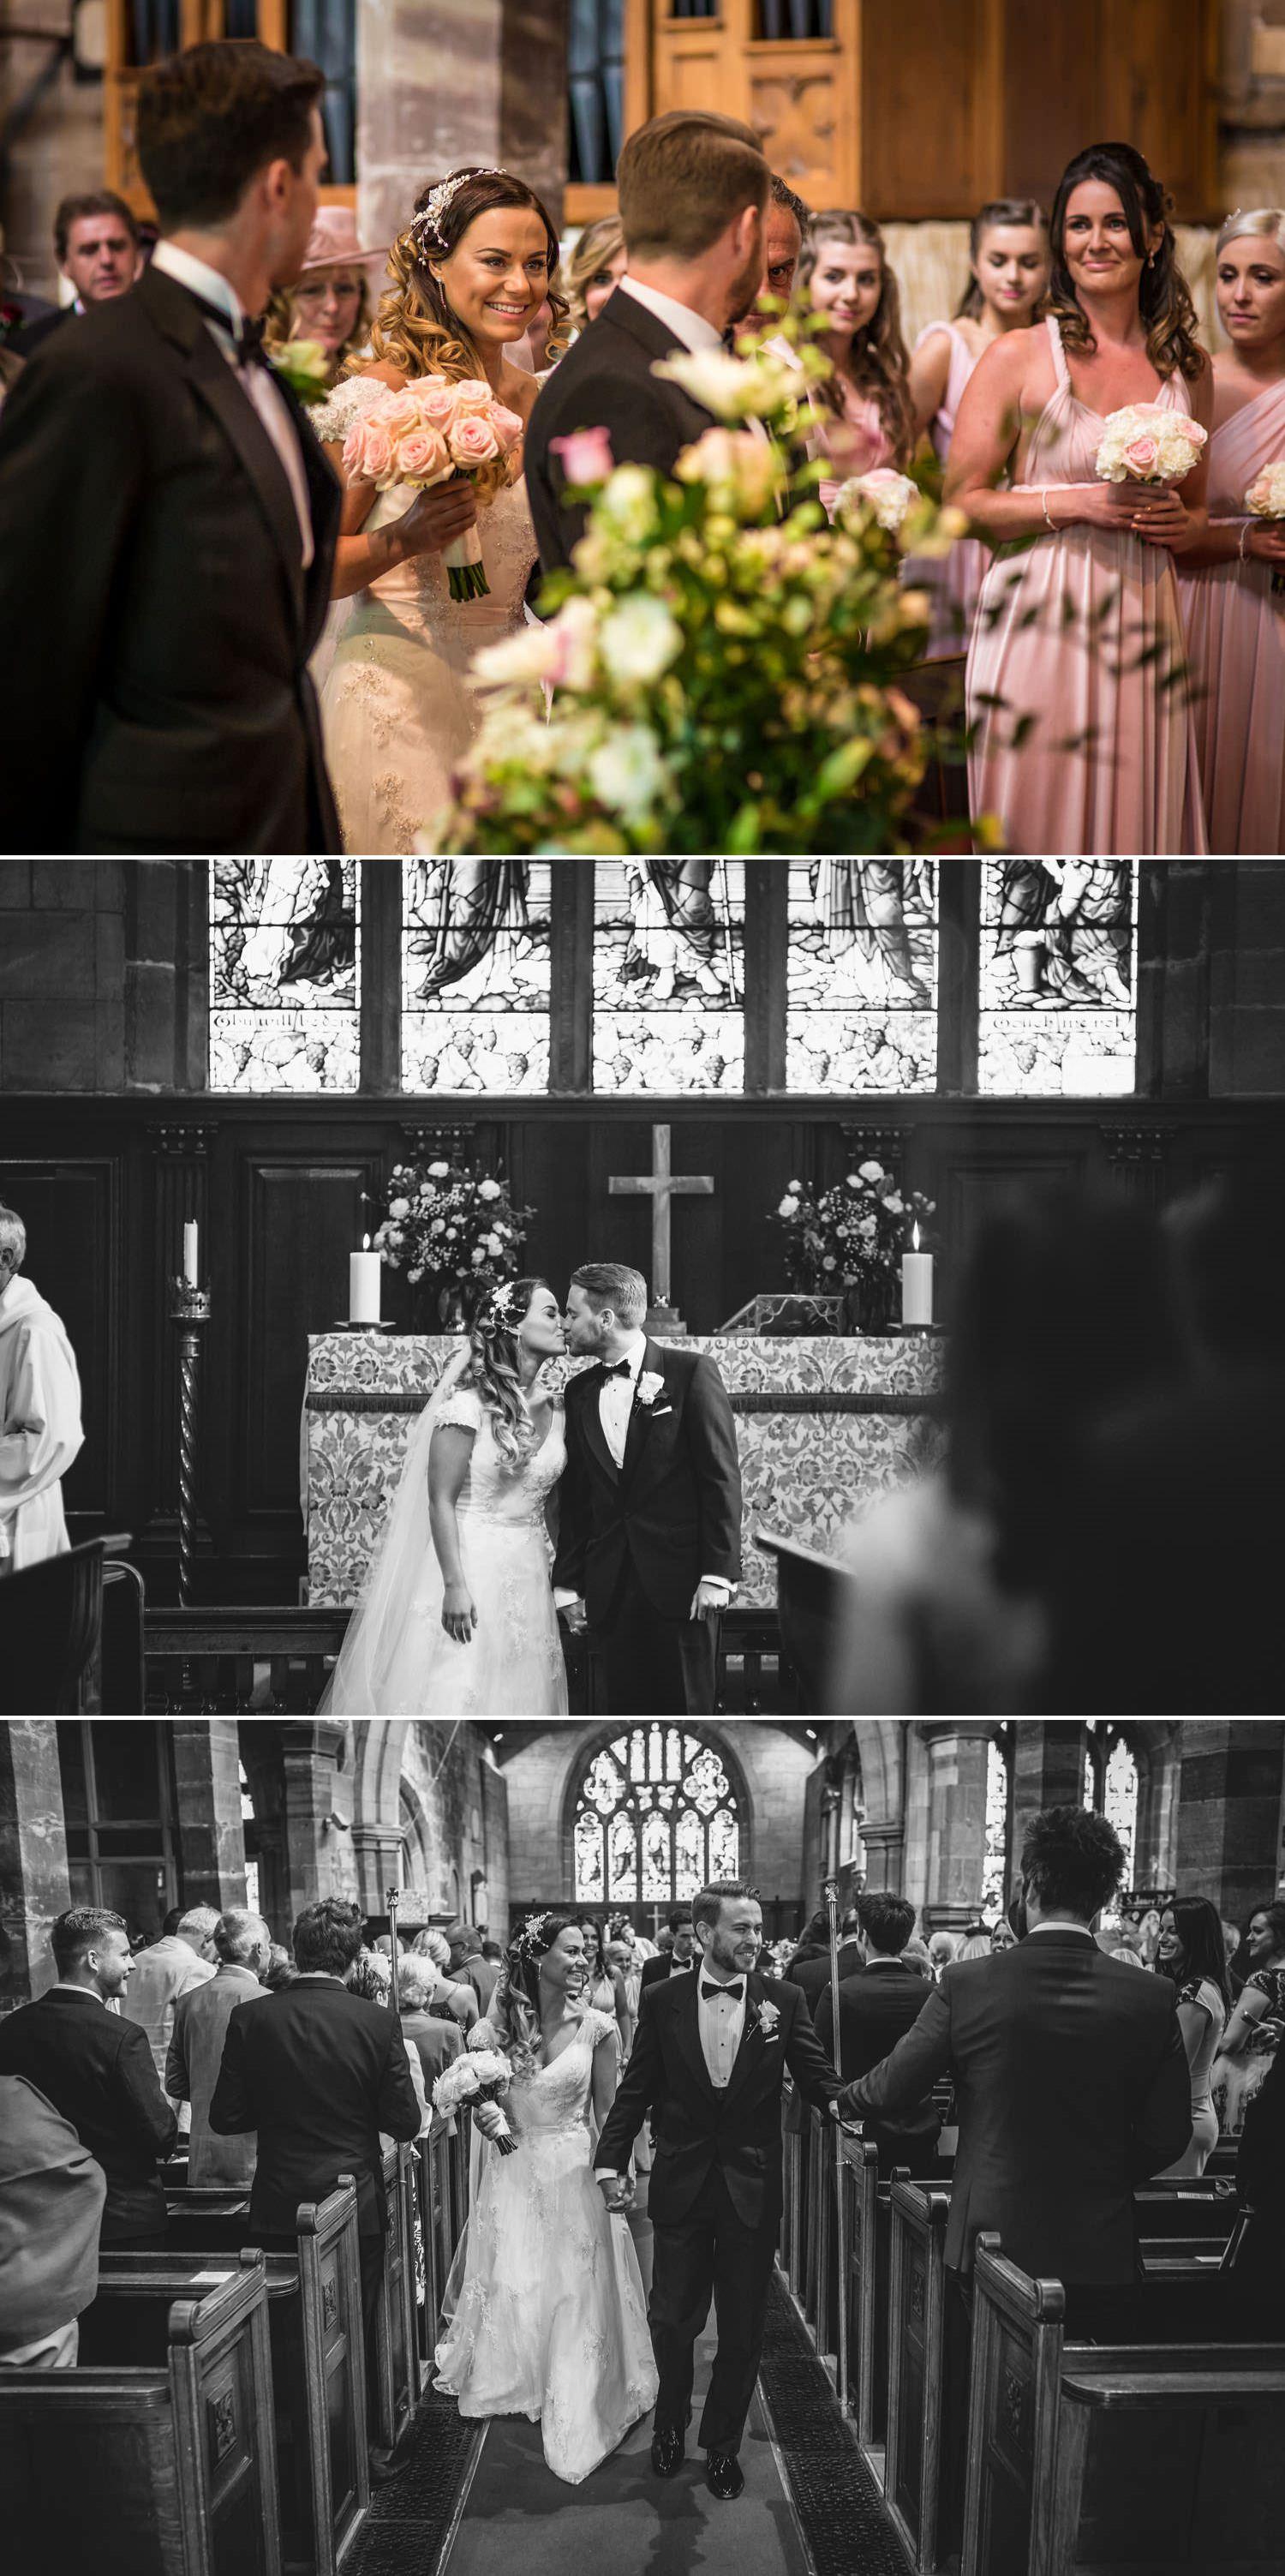 Wedding Photography Shropshire, first kiss